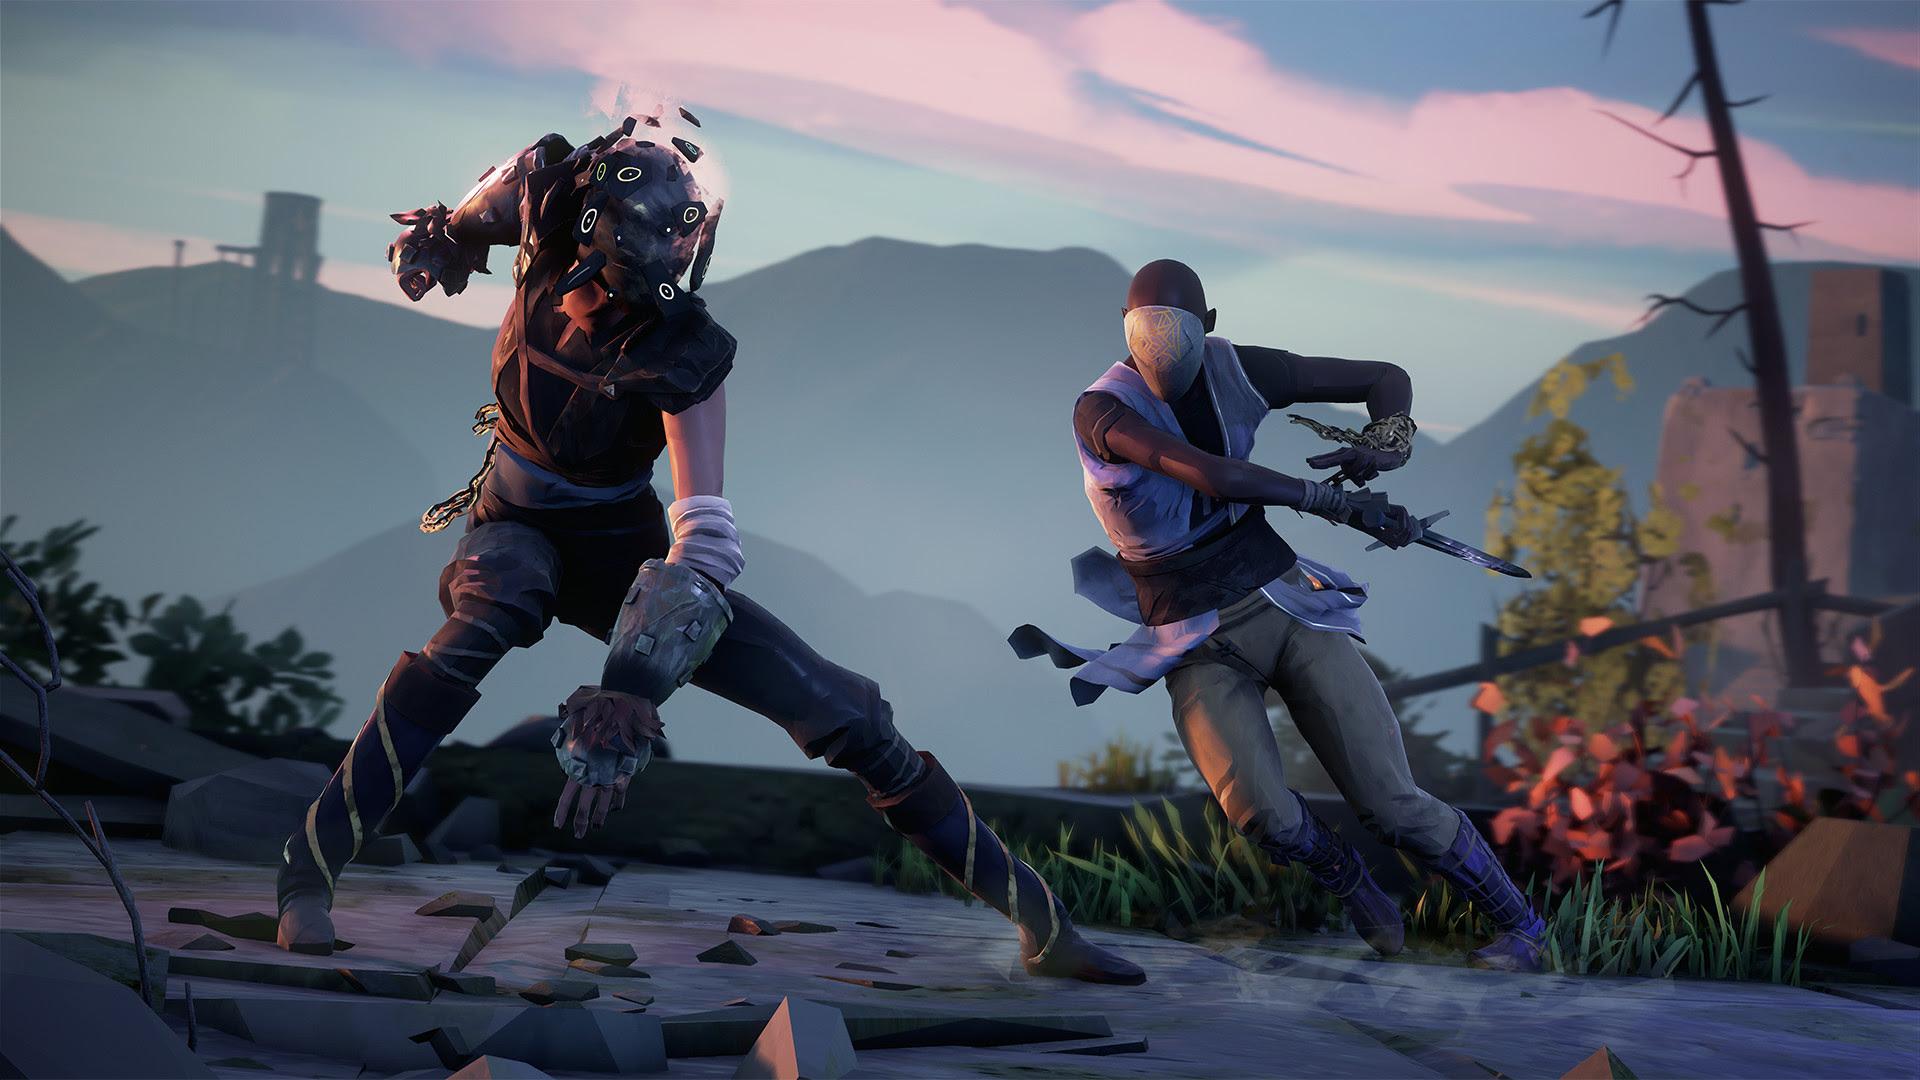 Melee combat game Absolver still looks intriguing screenshot